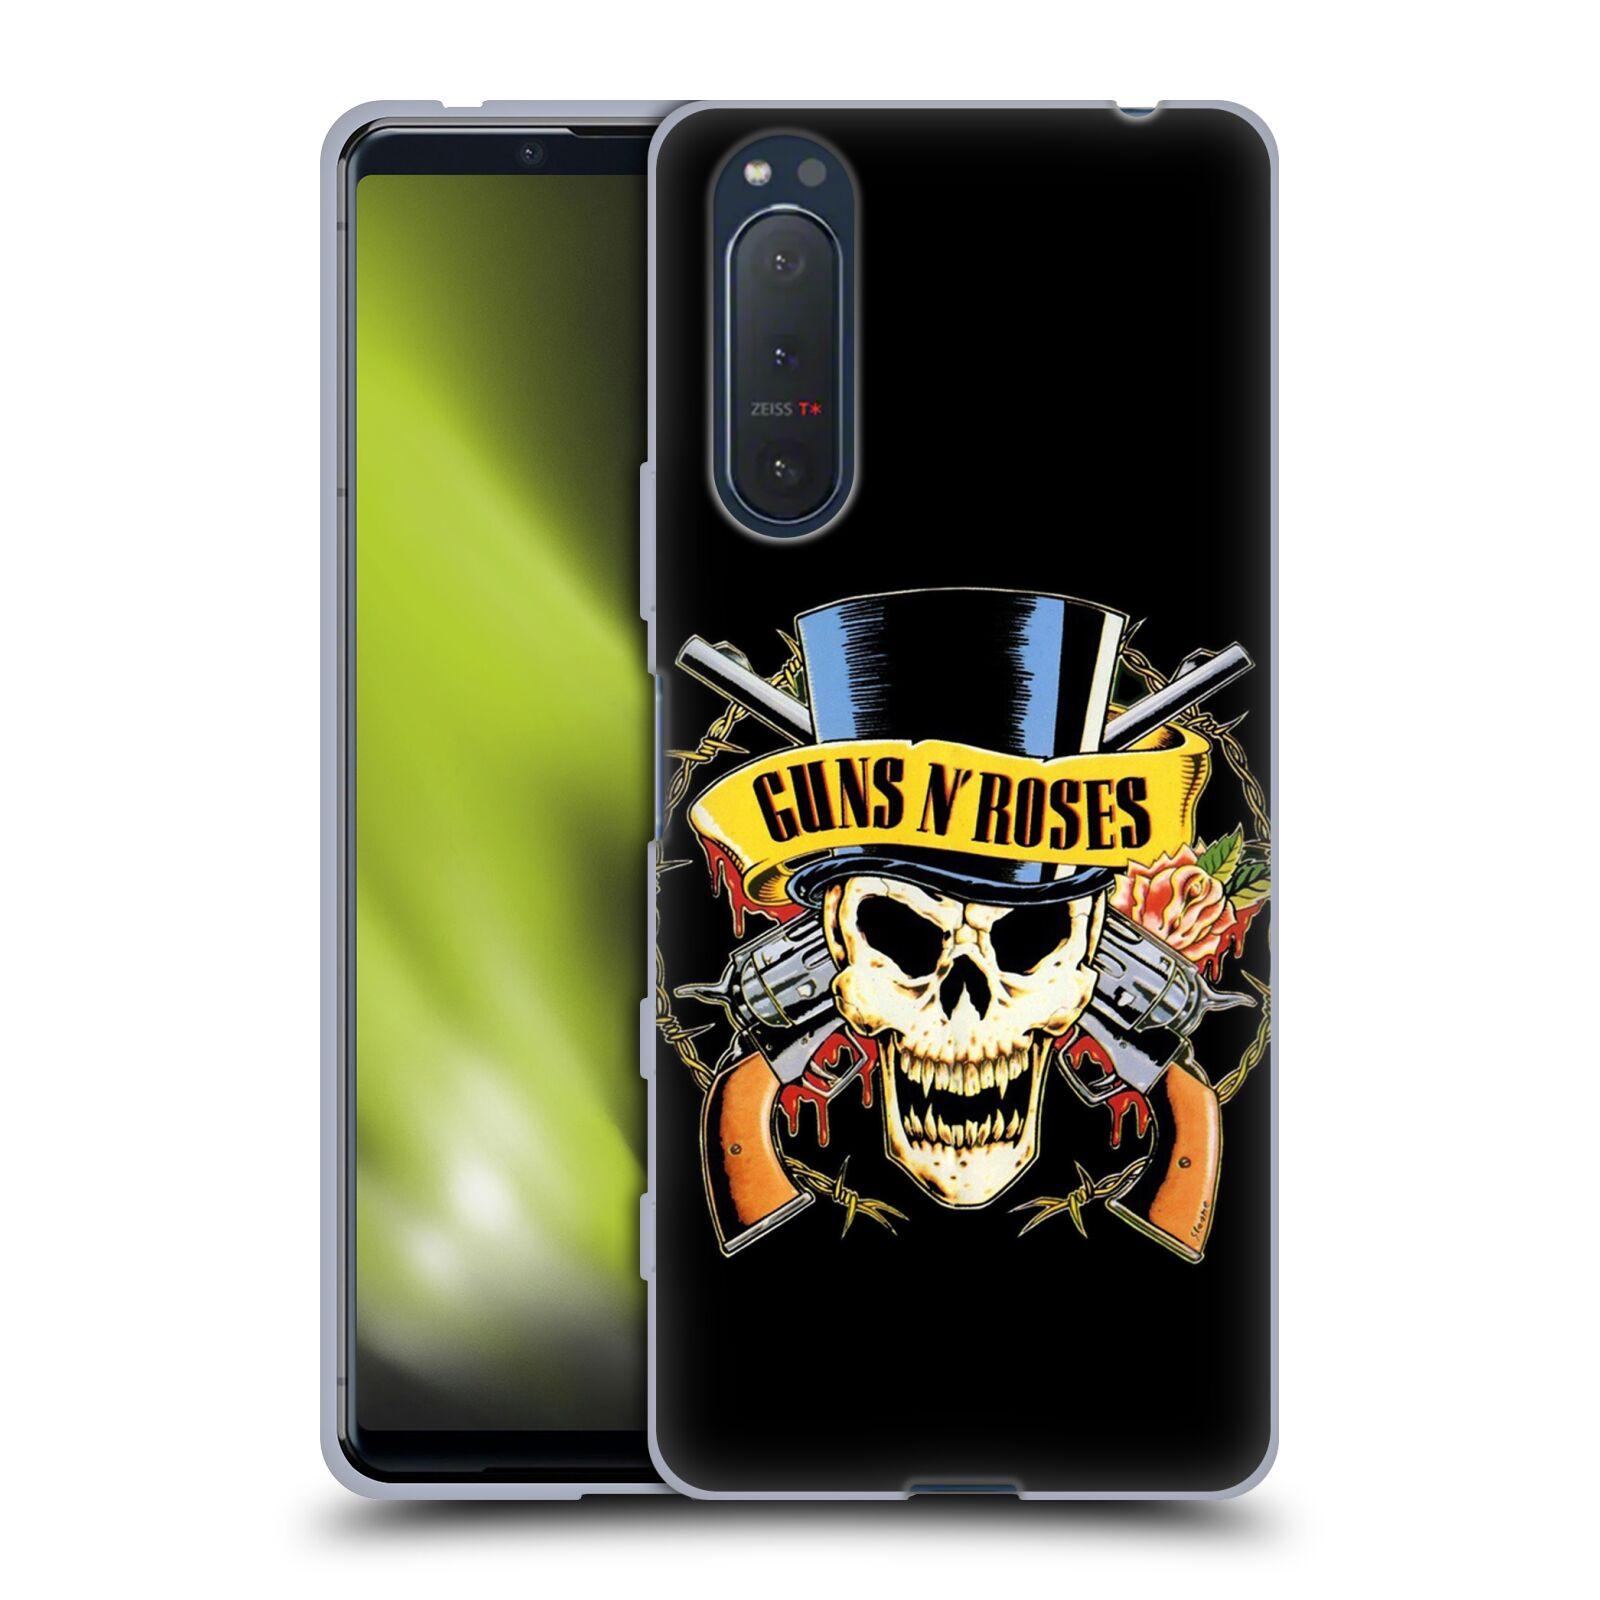 Silikonové pouzdro na mobil Sony Xperia 5 II - Head Case - Guns N' Roses - Lebka